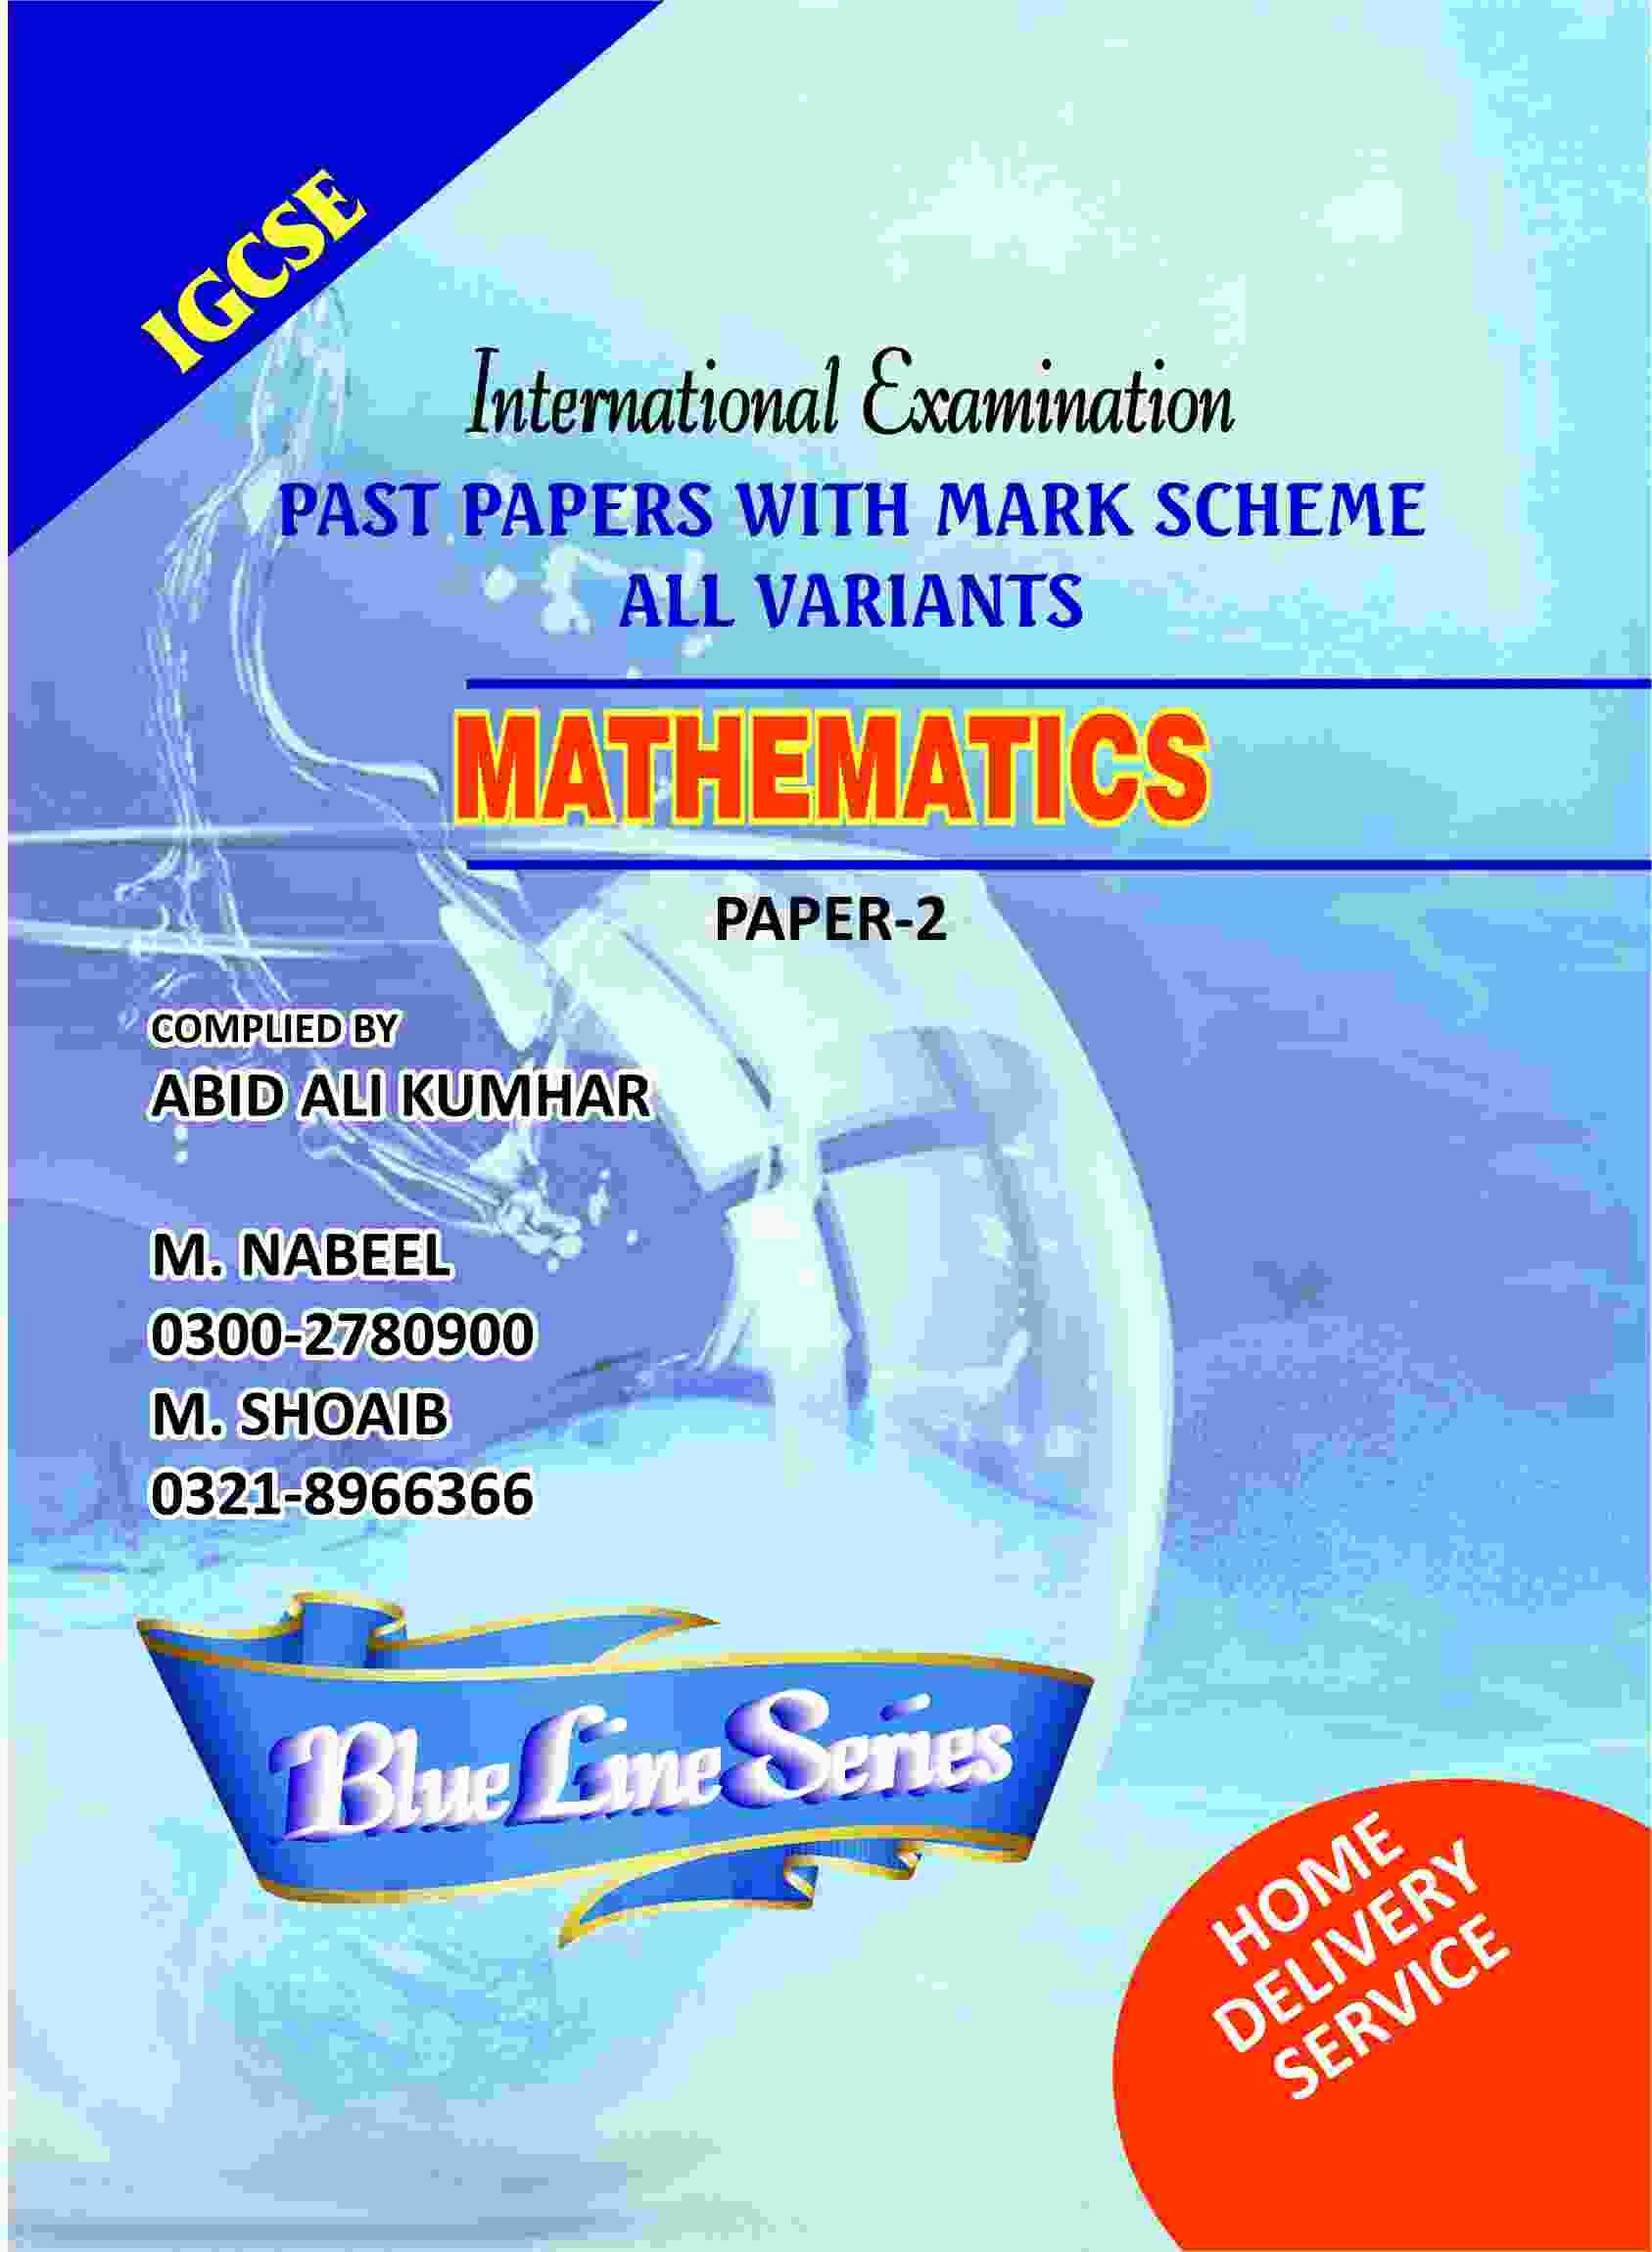 Igcse mathematics paper 2